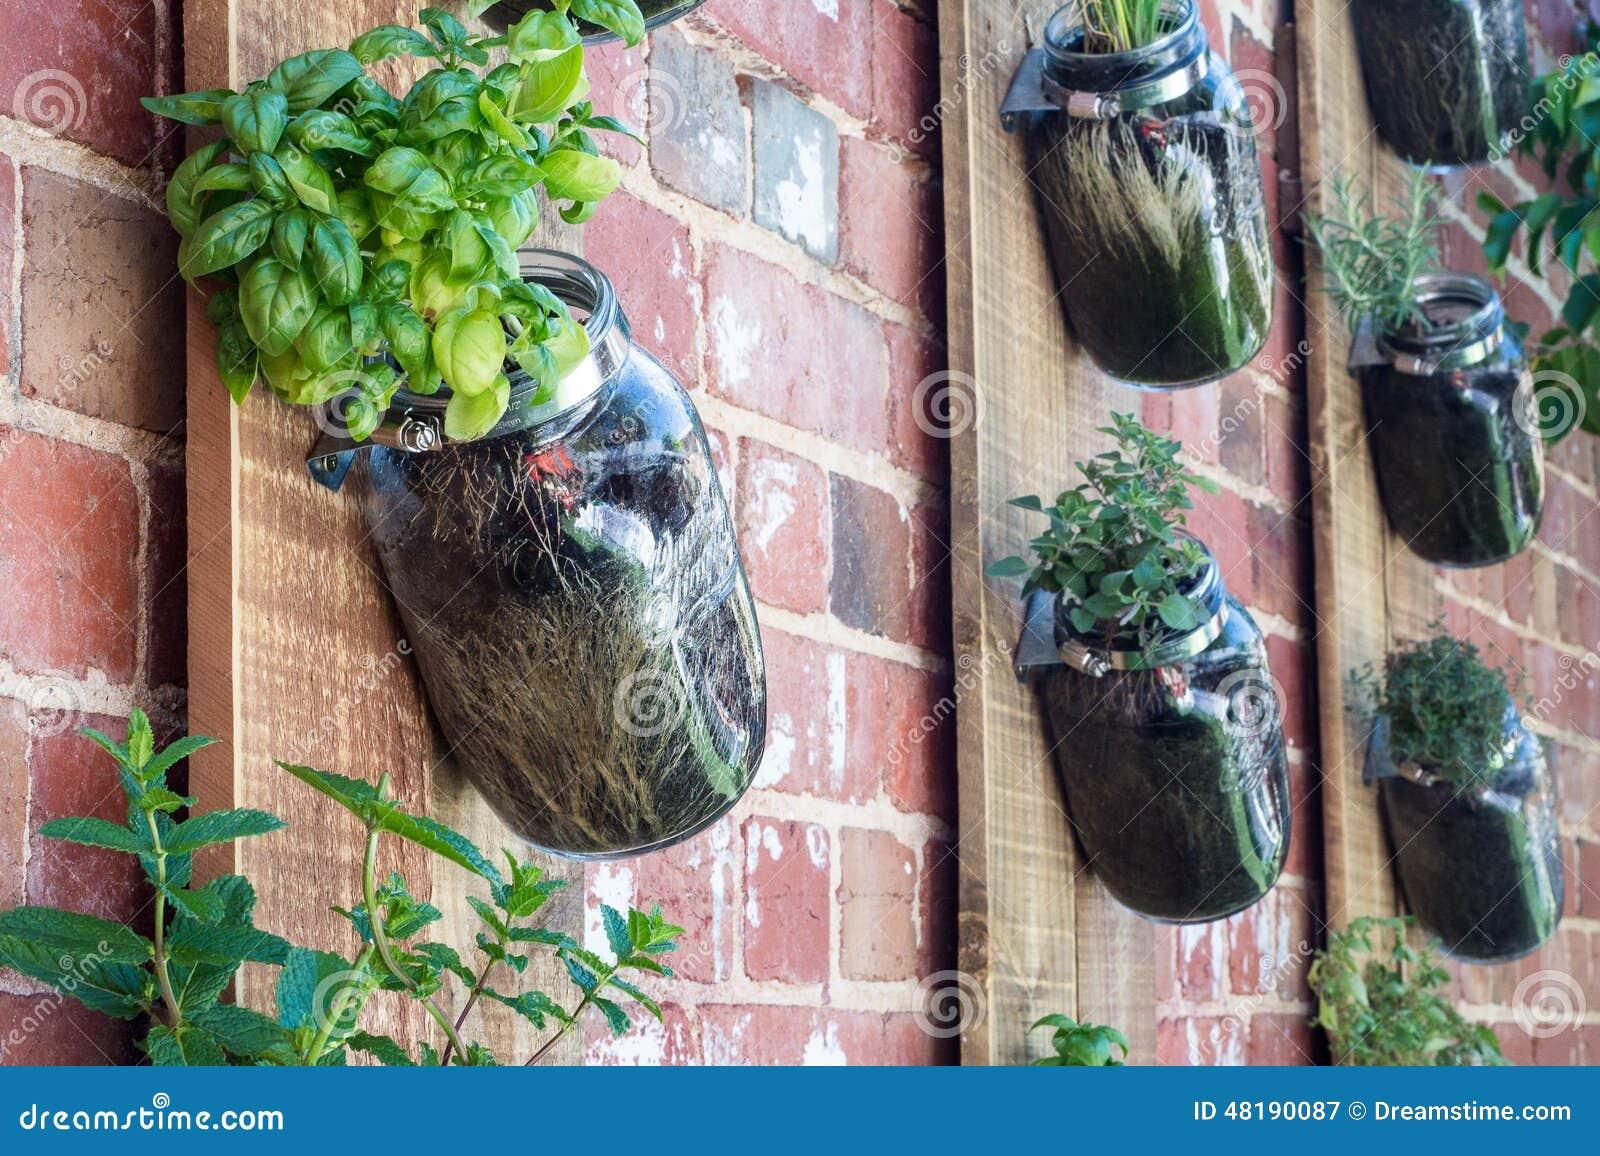 jardim vertical tijolo:Jardim vertical na parede de tijolo.